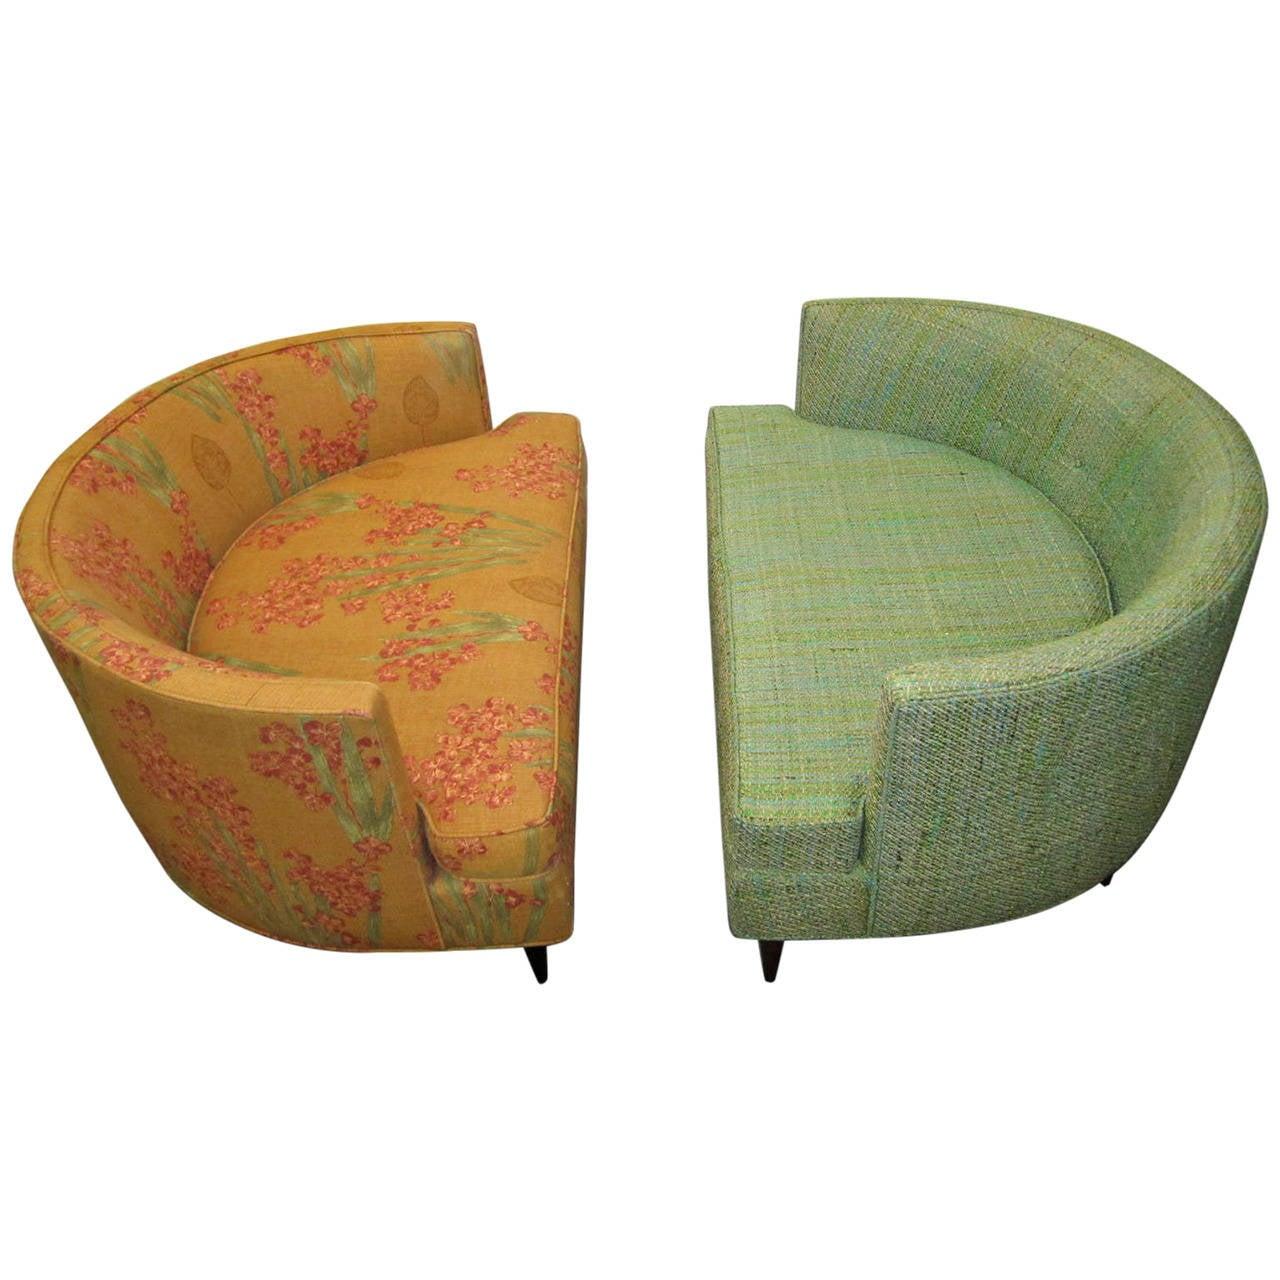 Pair of Unusual Wide Semi Circle Milo Baughman style Chairs Ottoman Mid centu